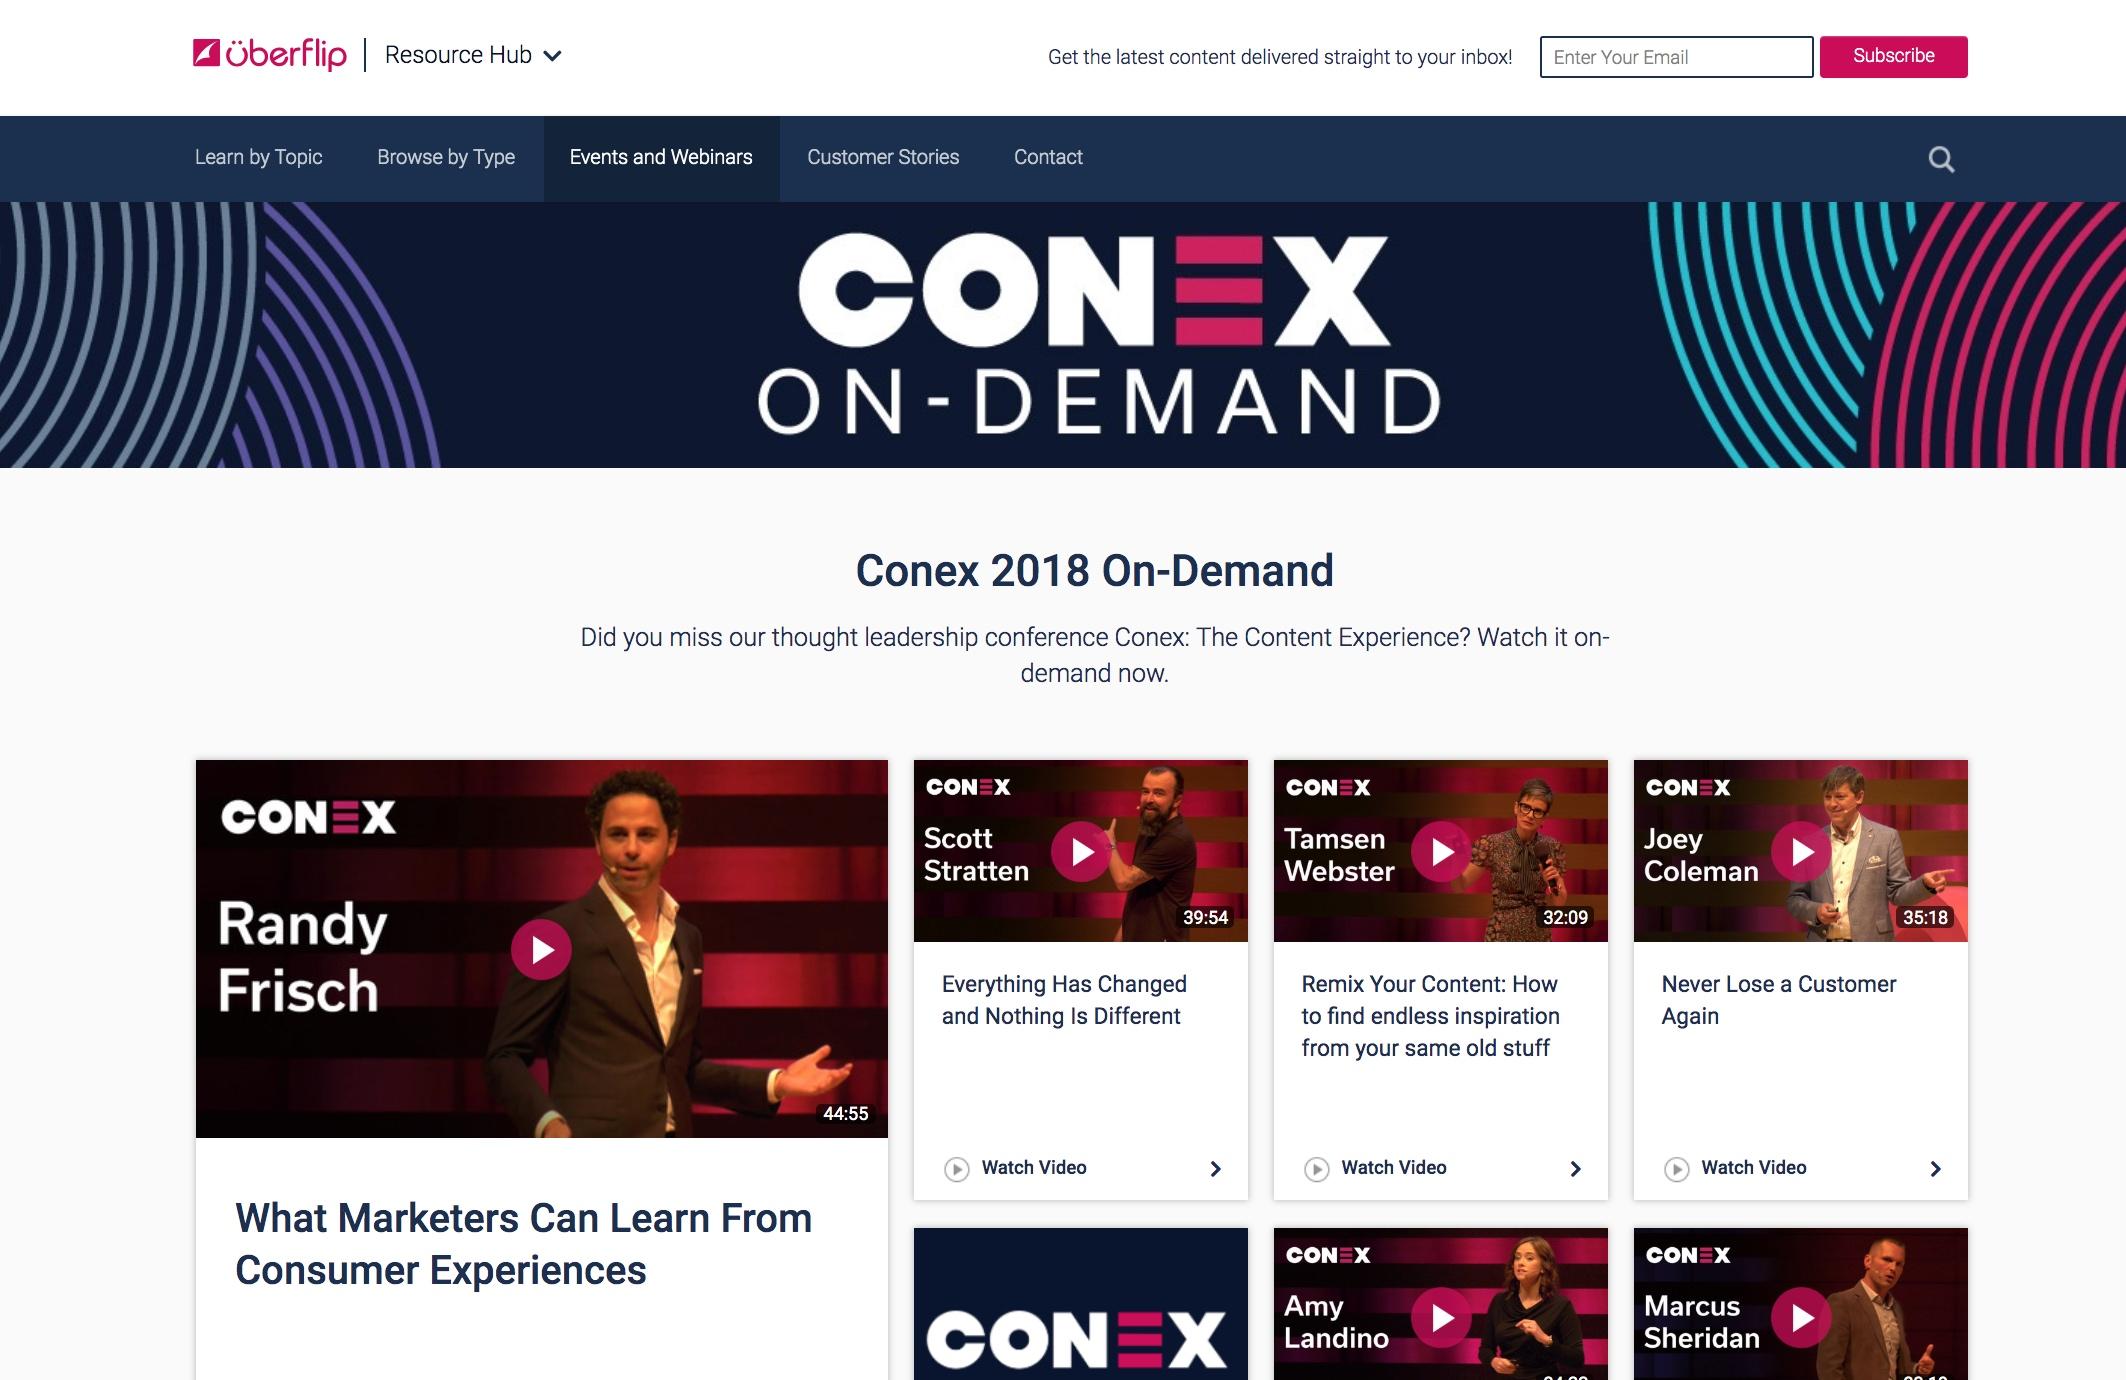 Conex on-demand stream